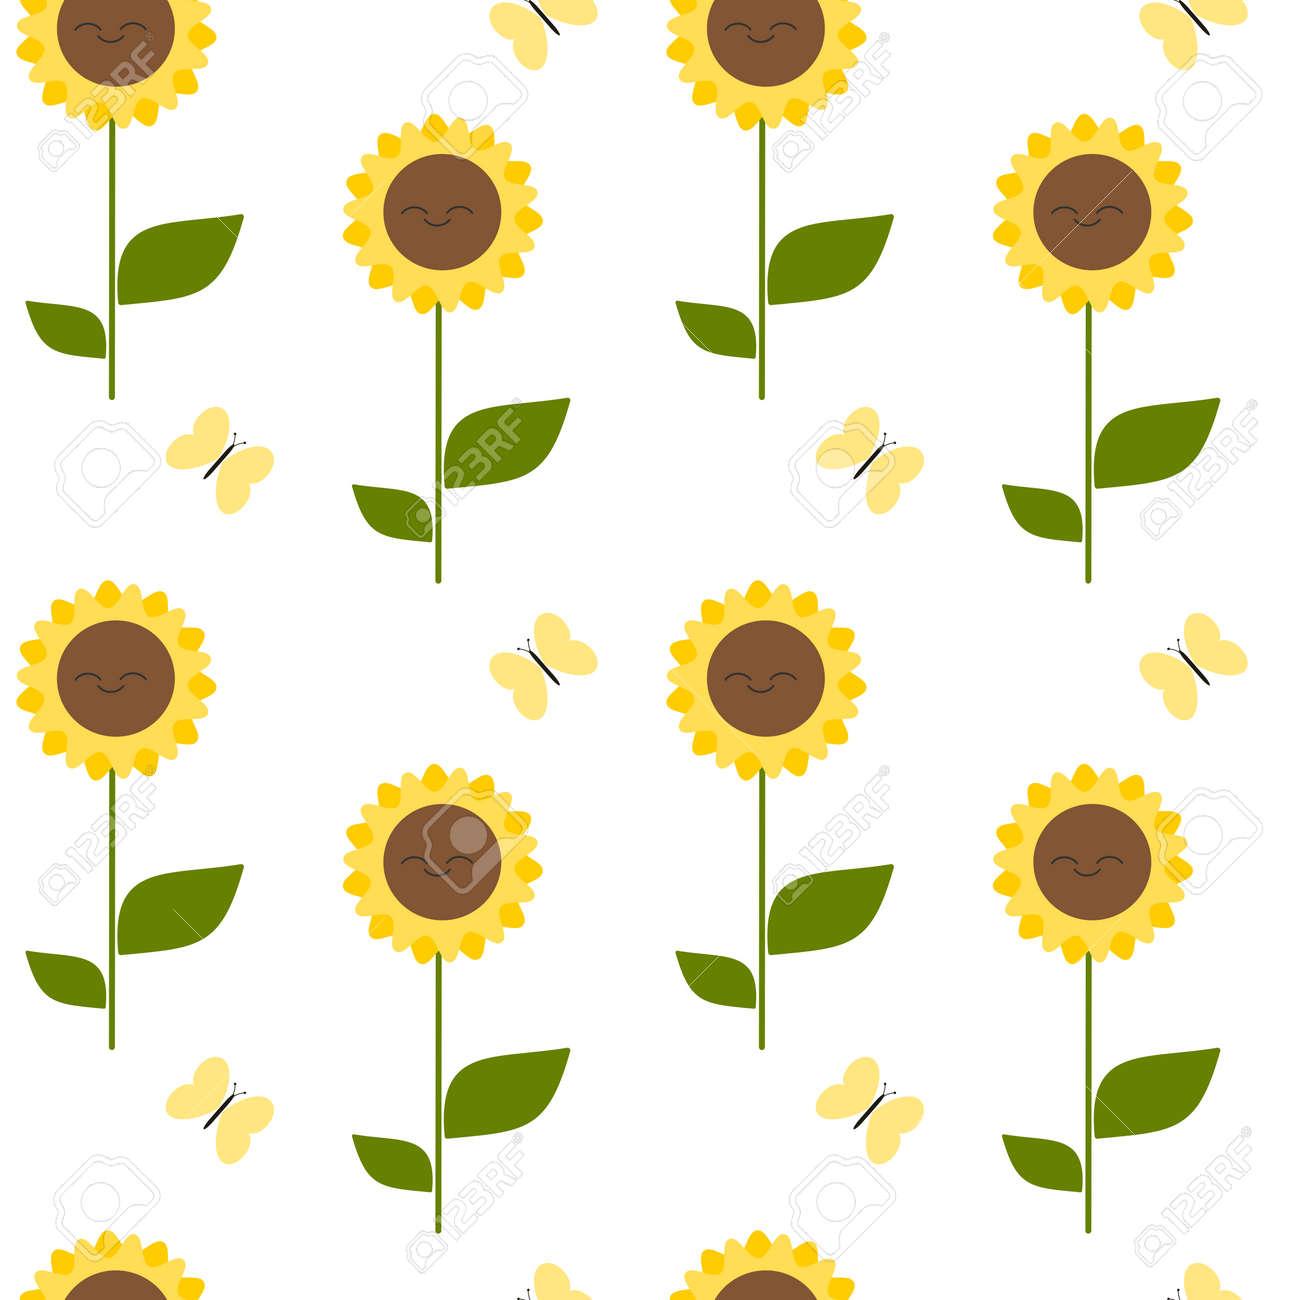 Cute Cartoon Sunflower Seamless Pattern Vector Background Stock